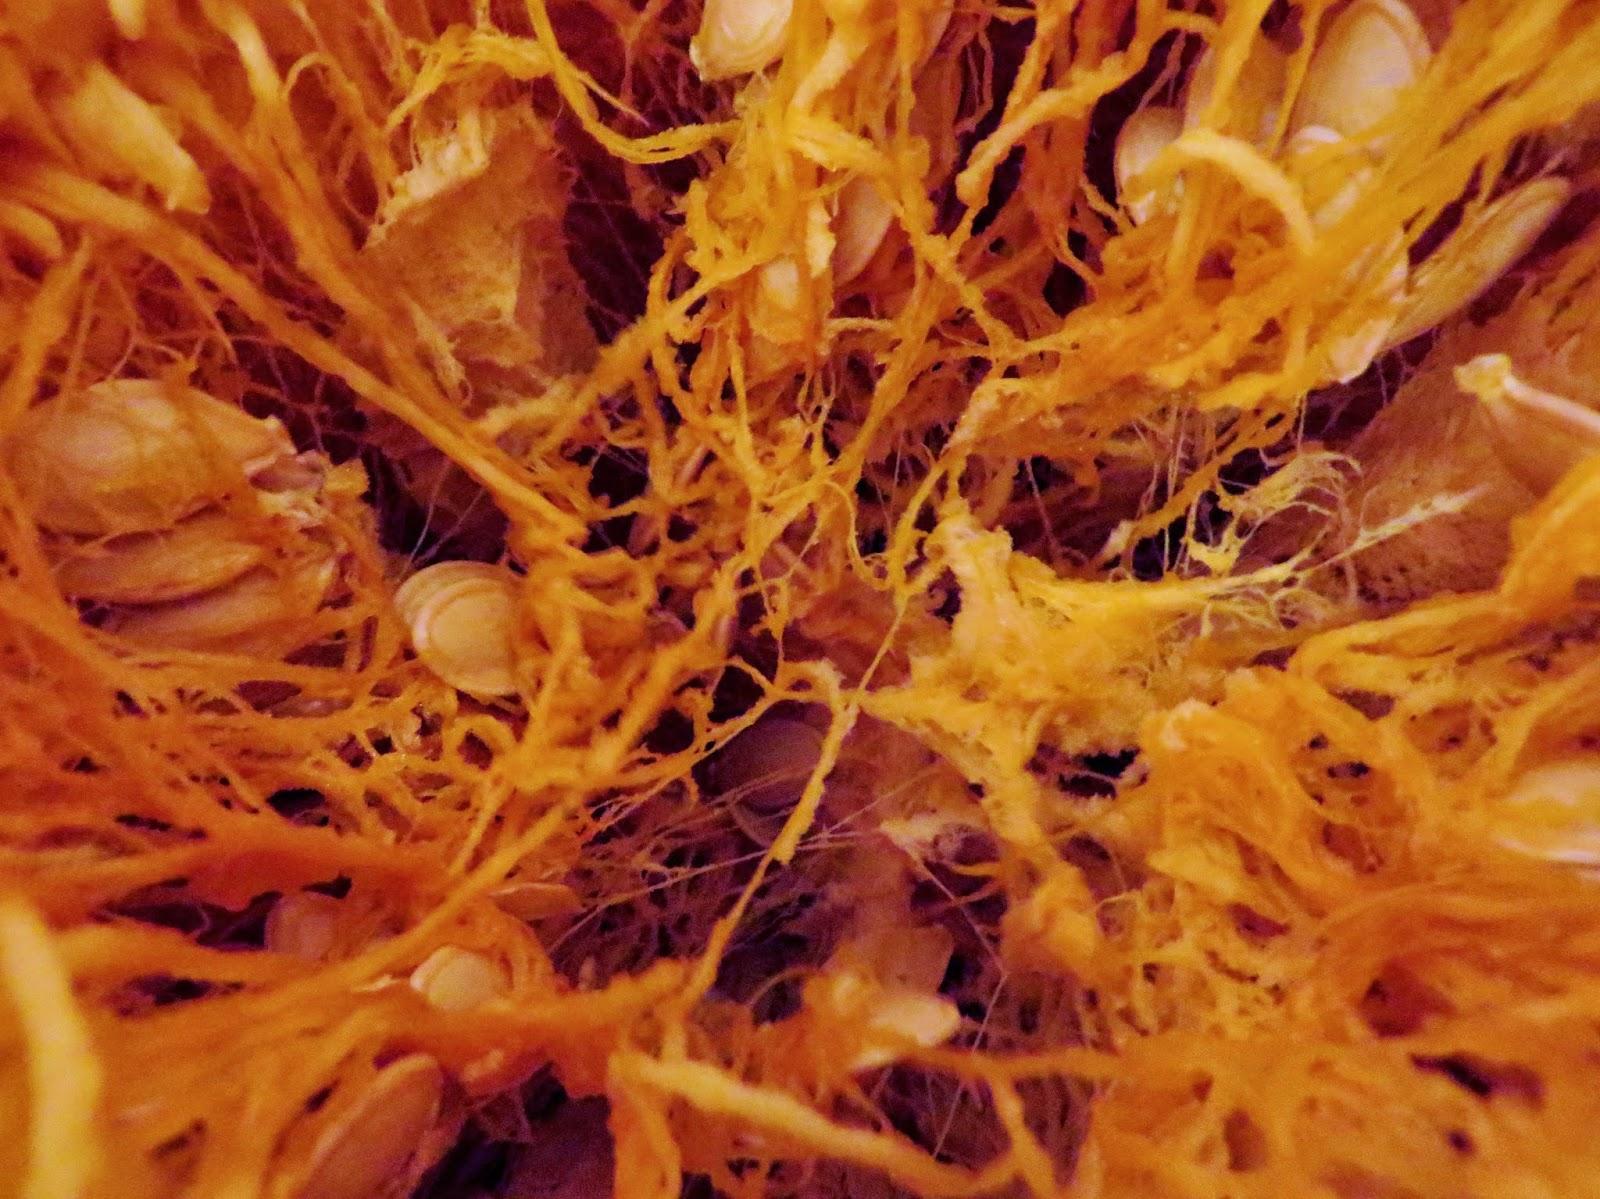 pumpkin guts, pumpkin insides, pumpkin, spaghetti squash, stringy pumpkin, pumpkin carving, halloween